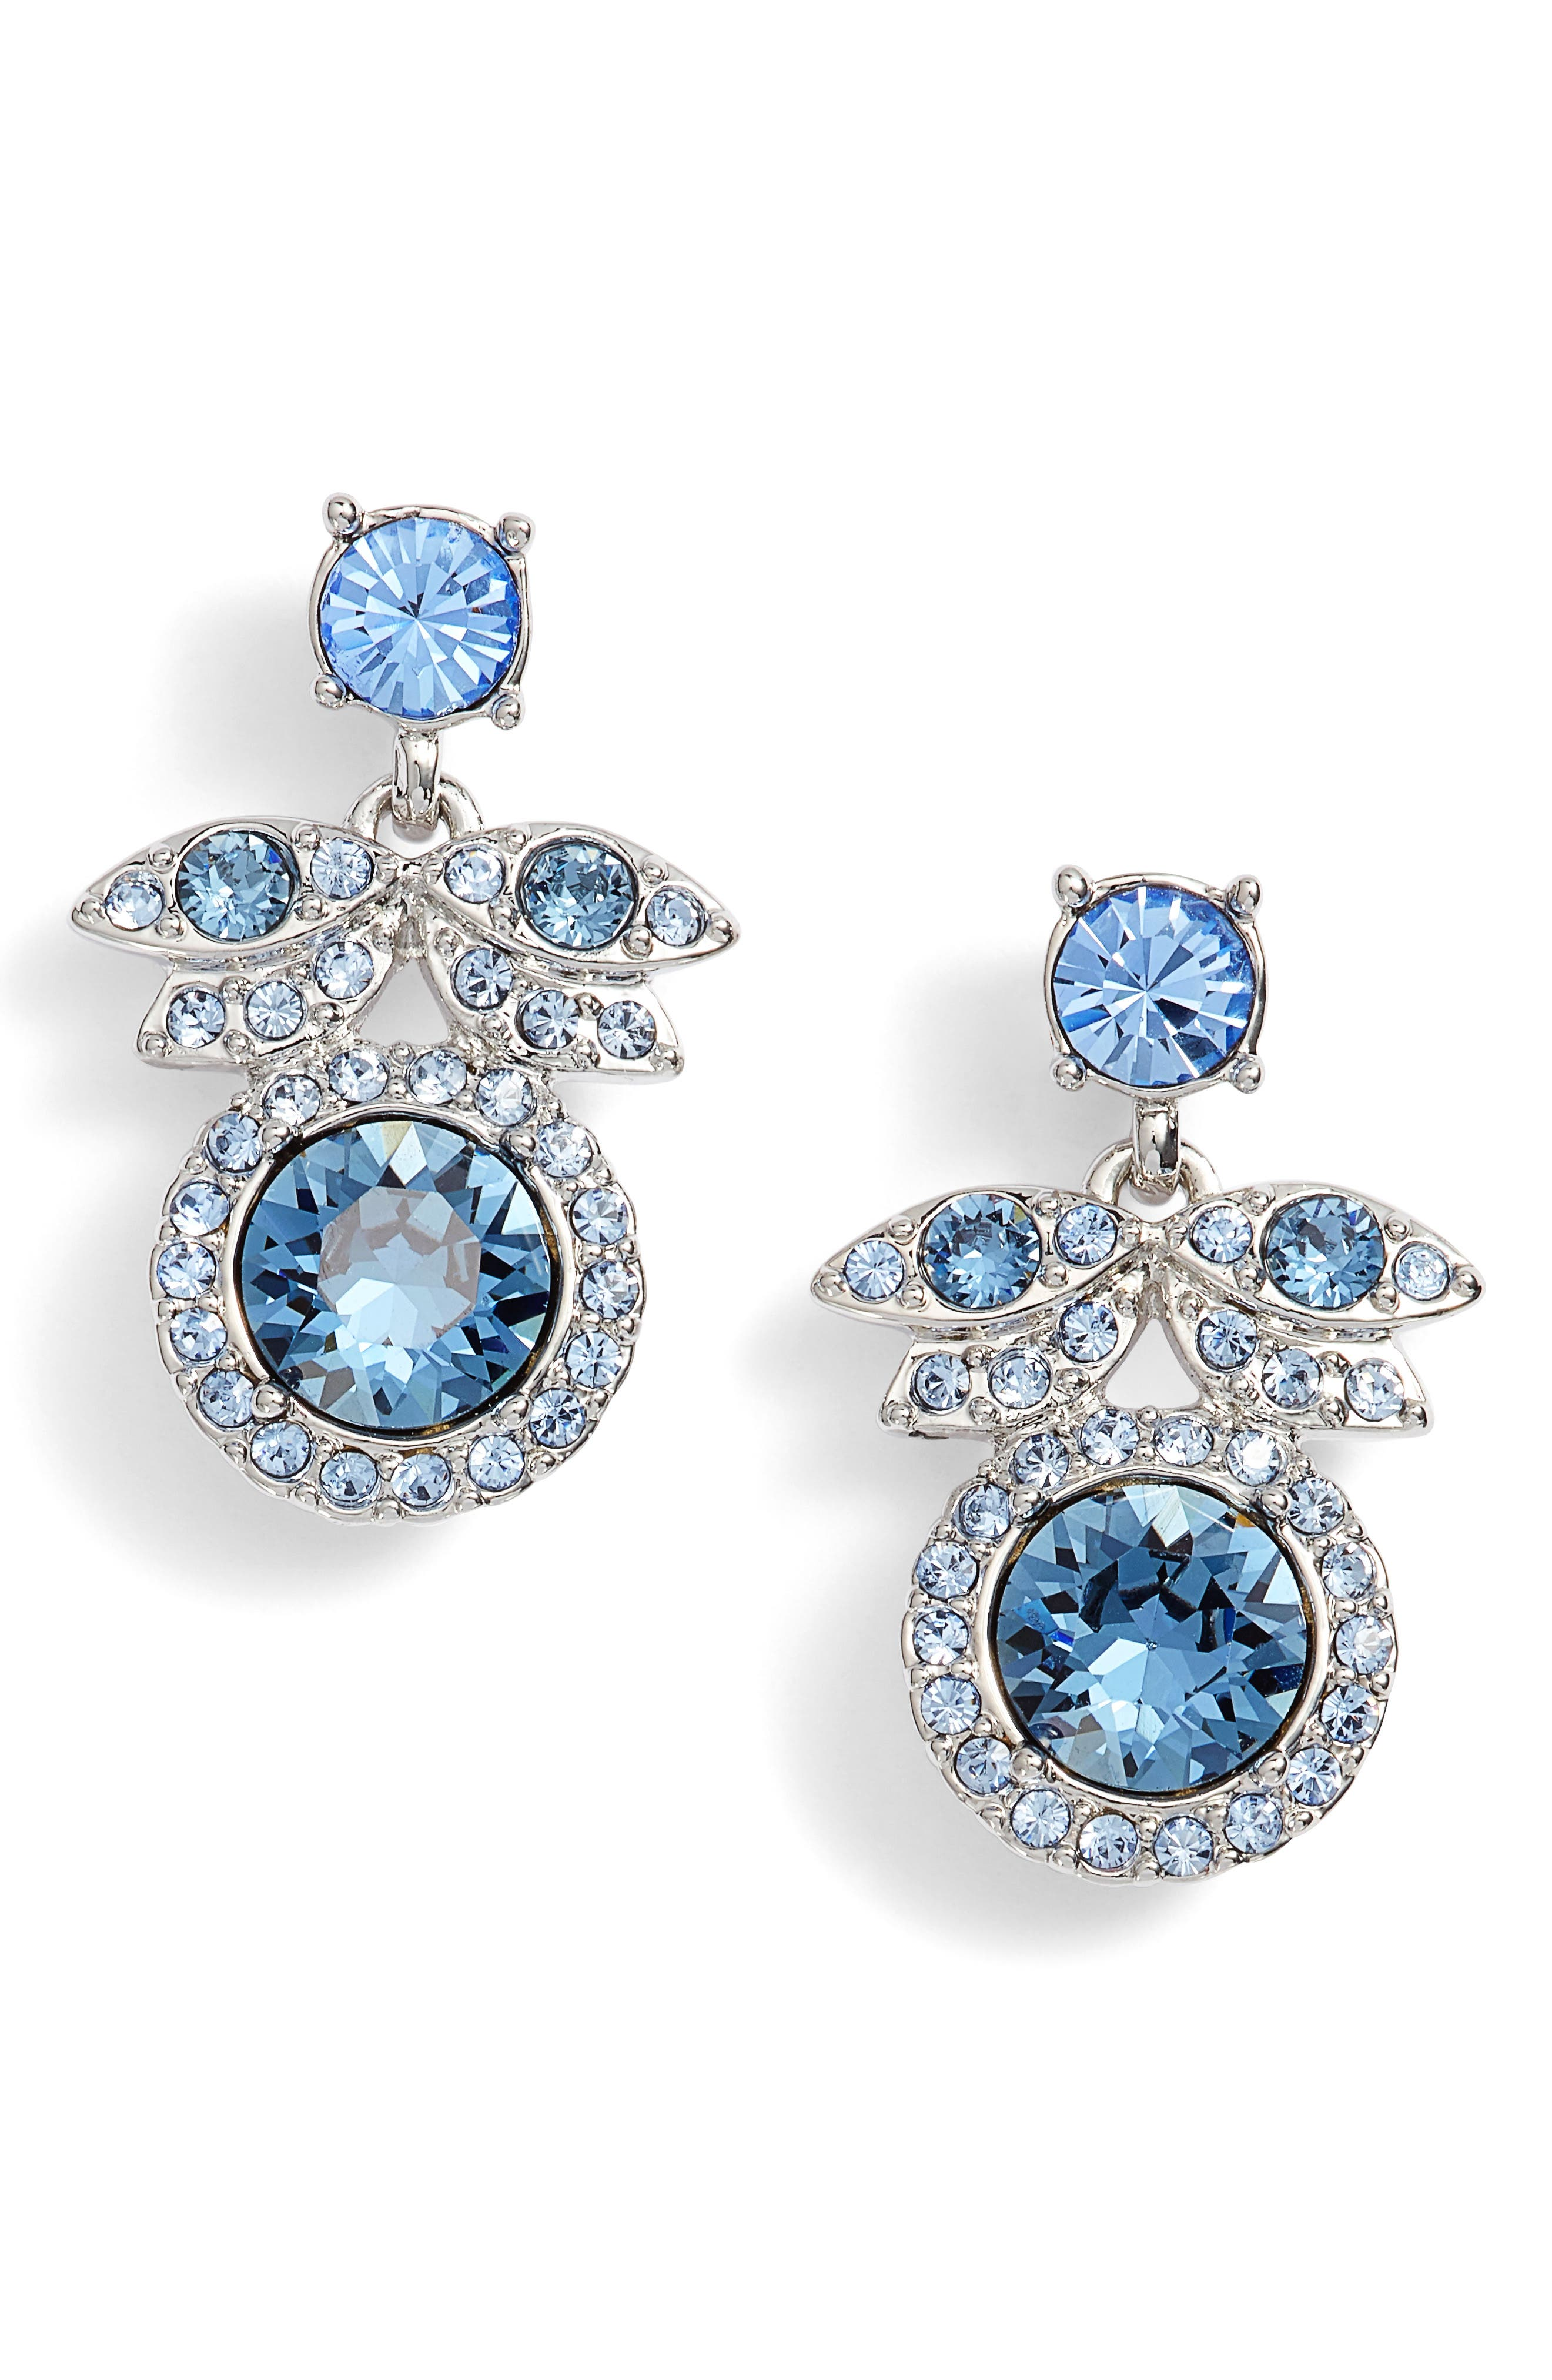 Crystal Drop Earrings,                             Main thumbnail 1, color,                             040